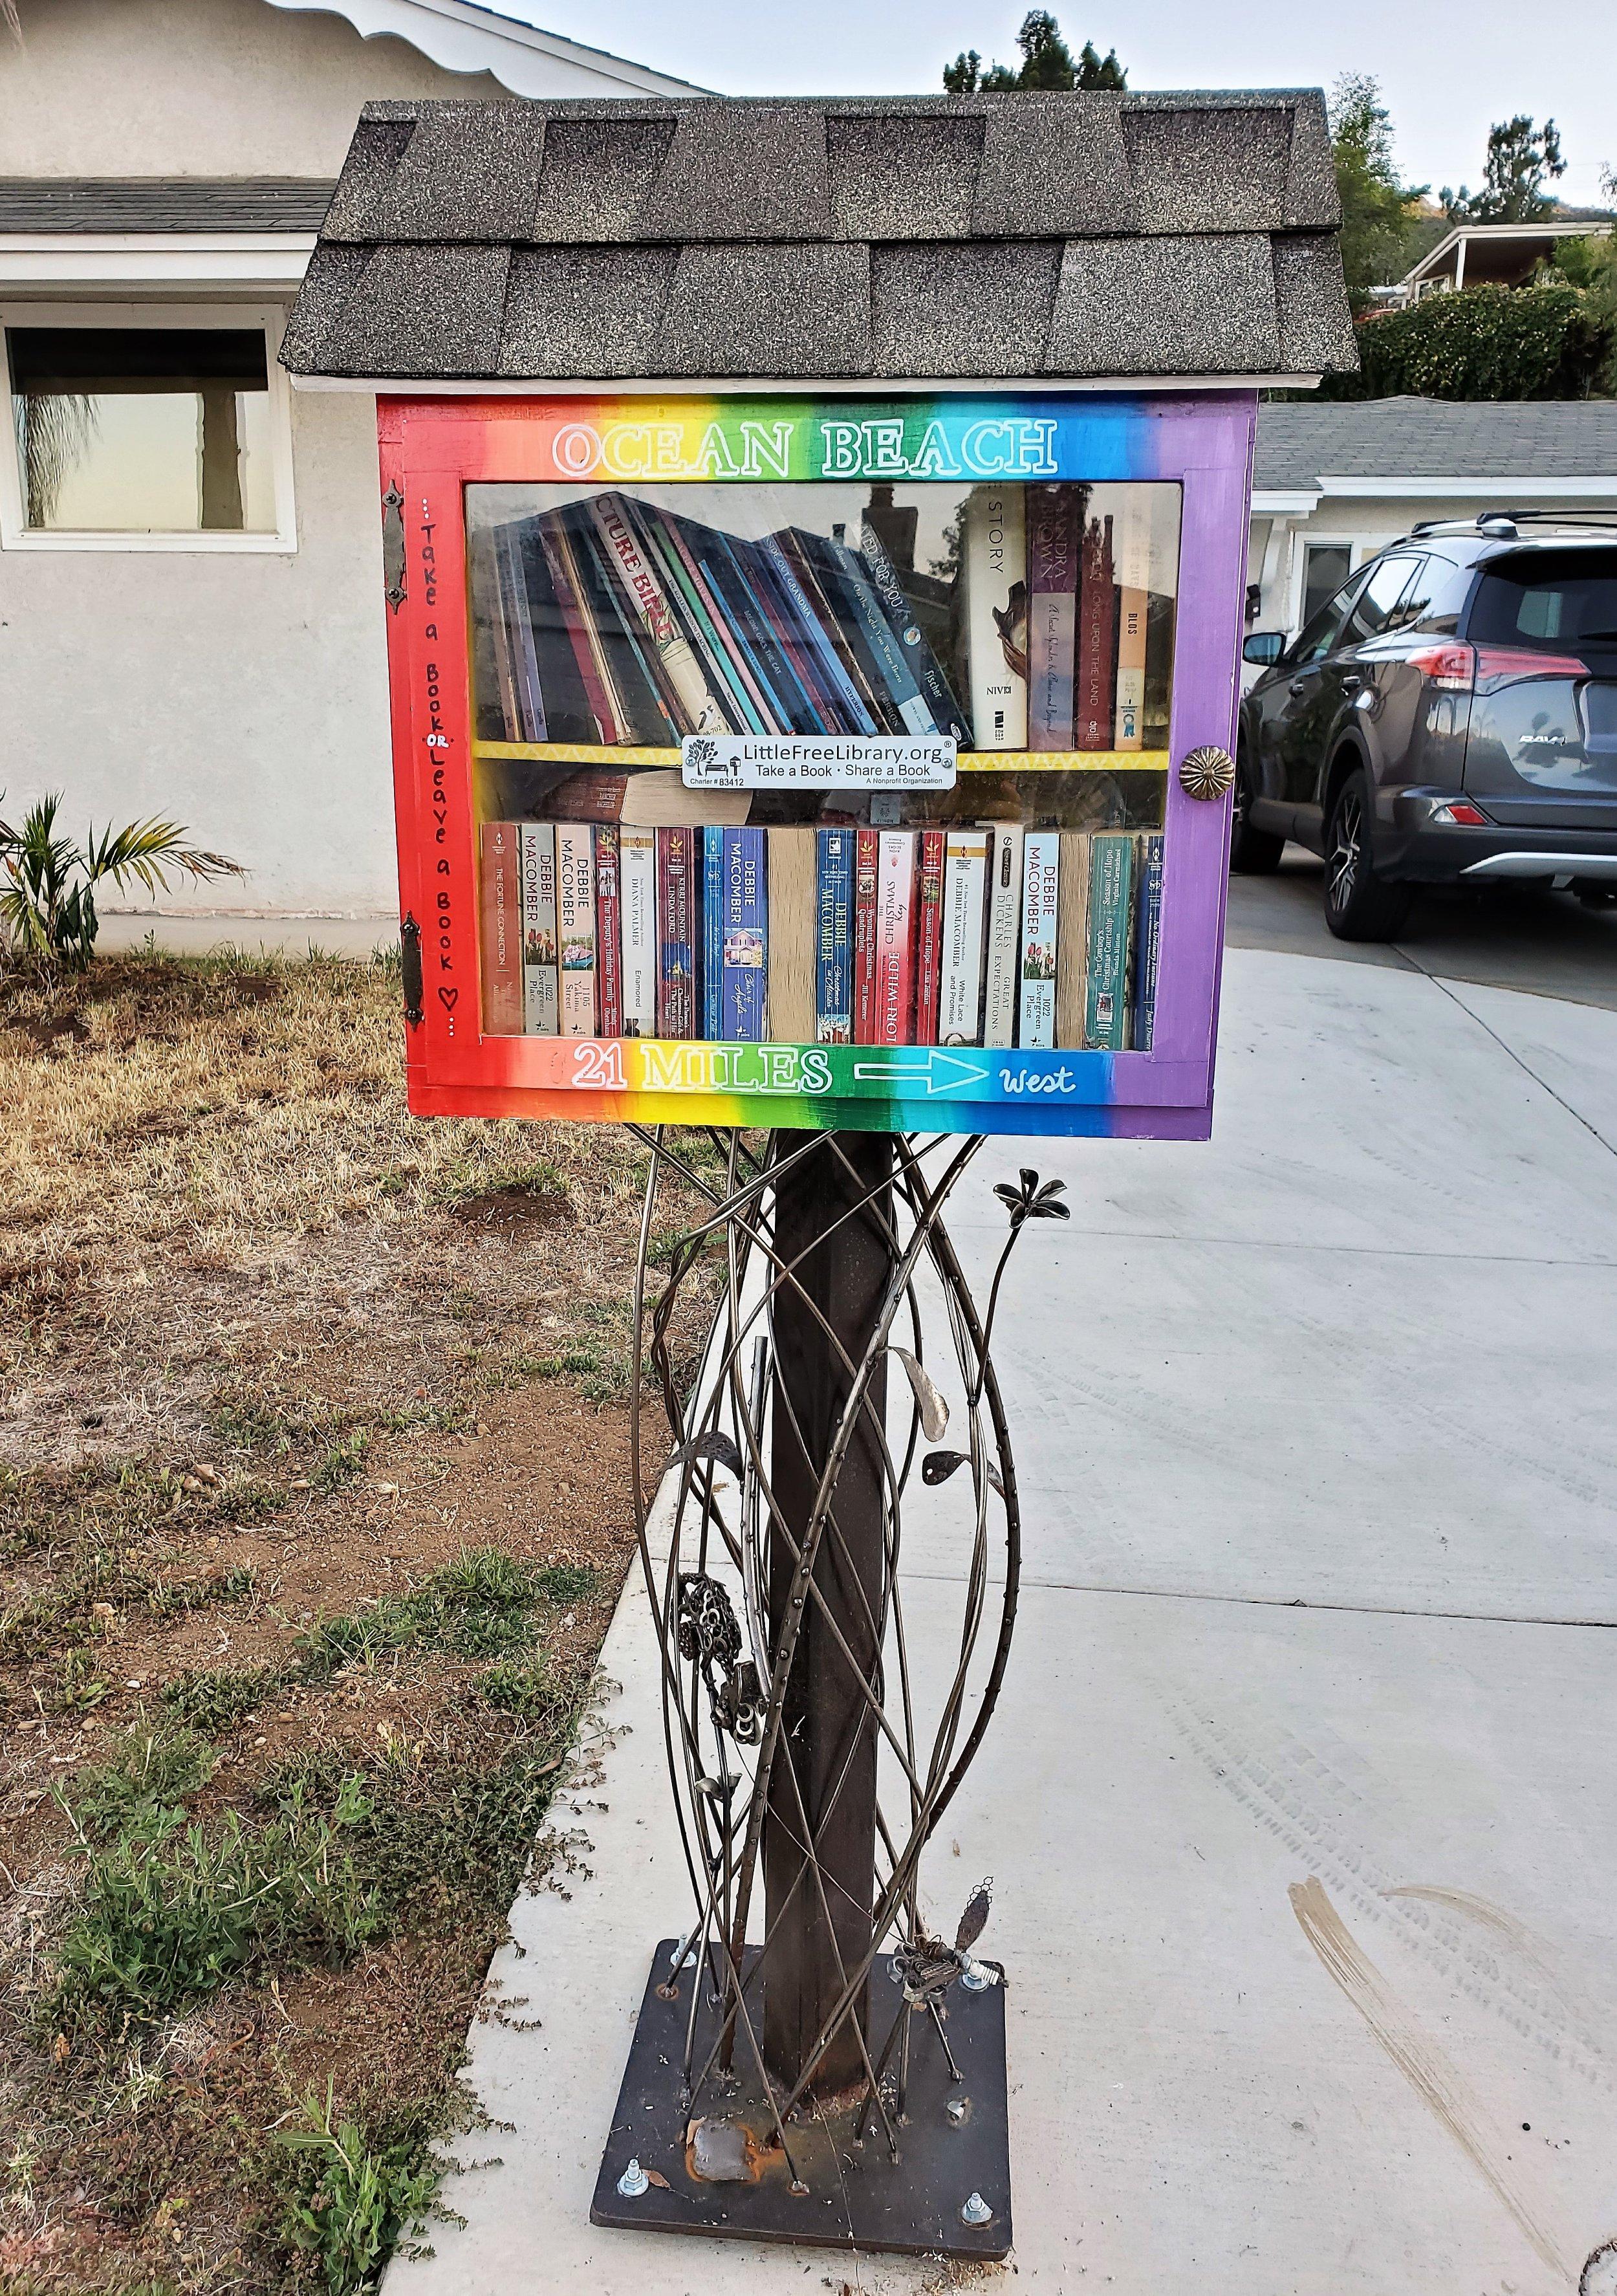 Another Little Free Library in Eyah Swambat's neighborhood in Santee